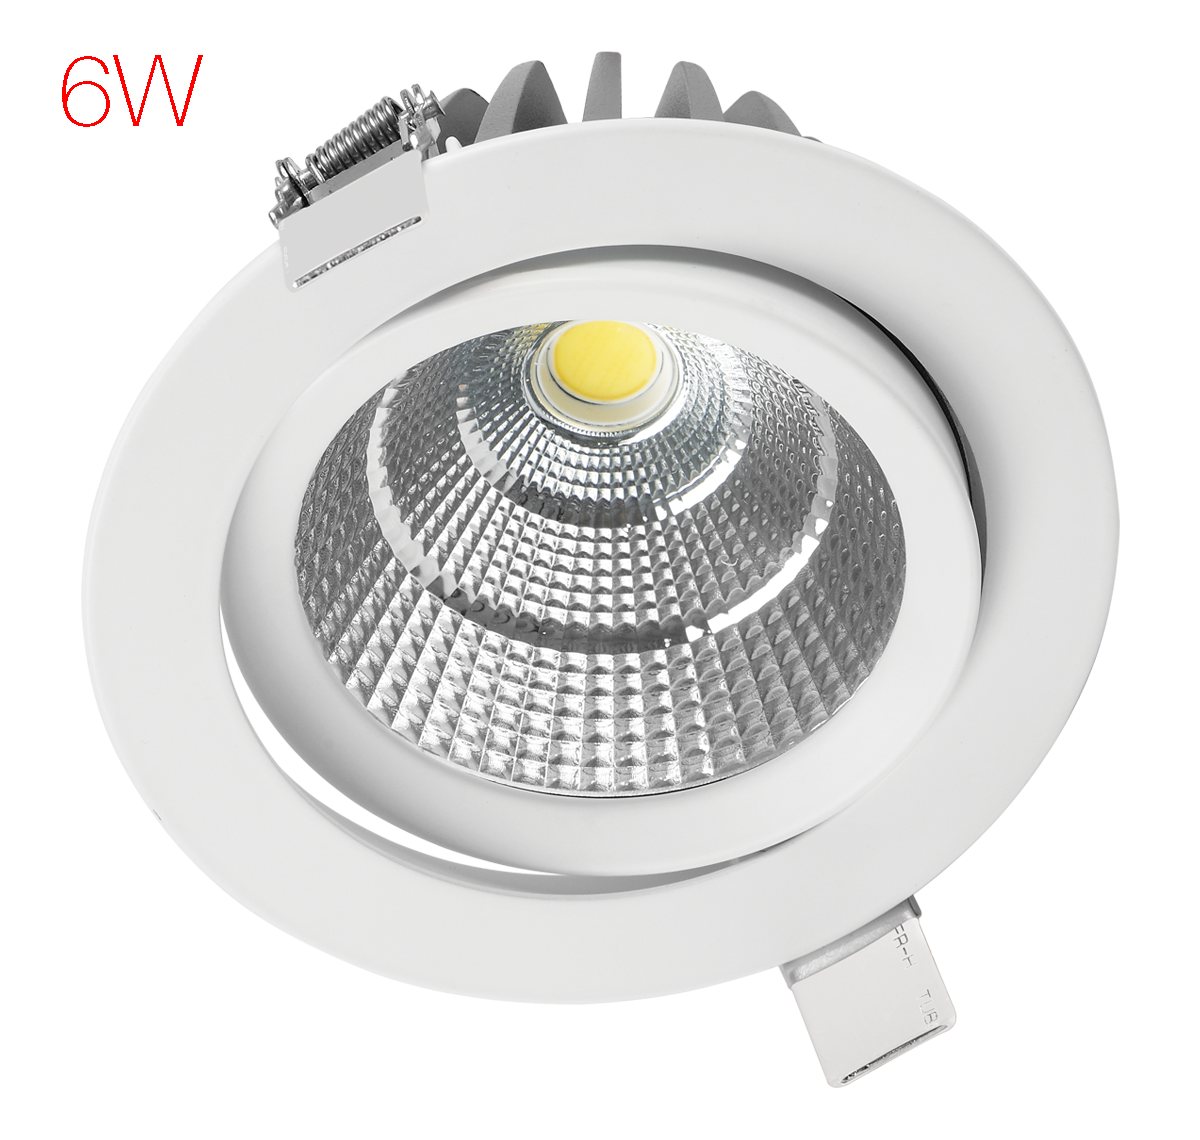 Crysta COB Swivel Spotlight 6 W 6500 K